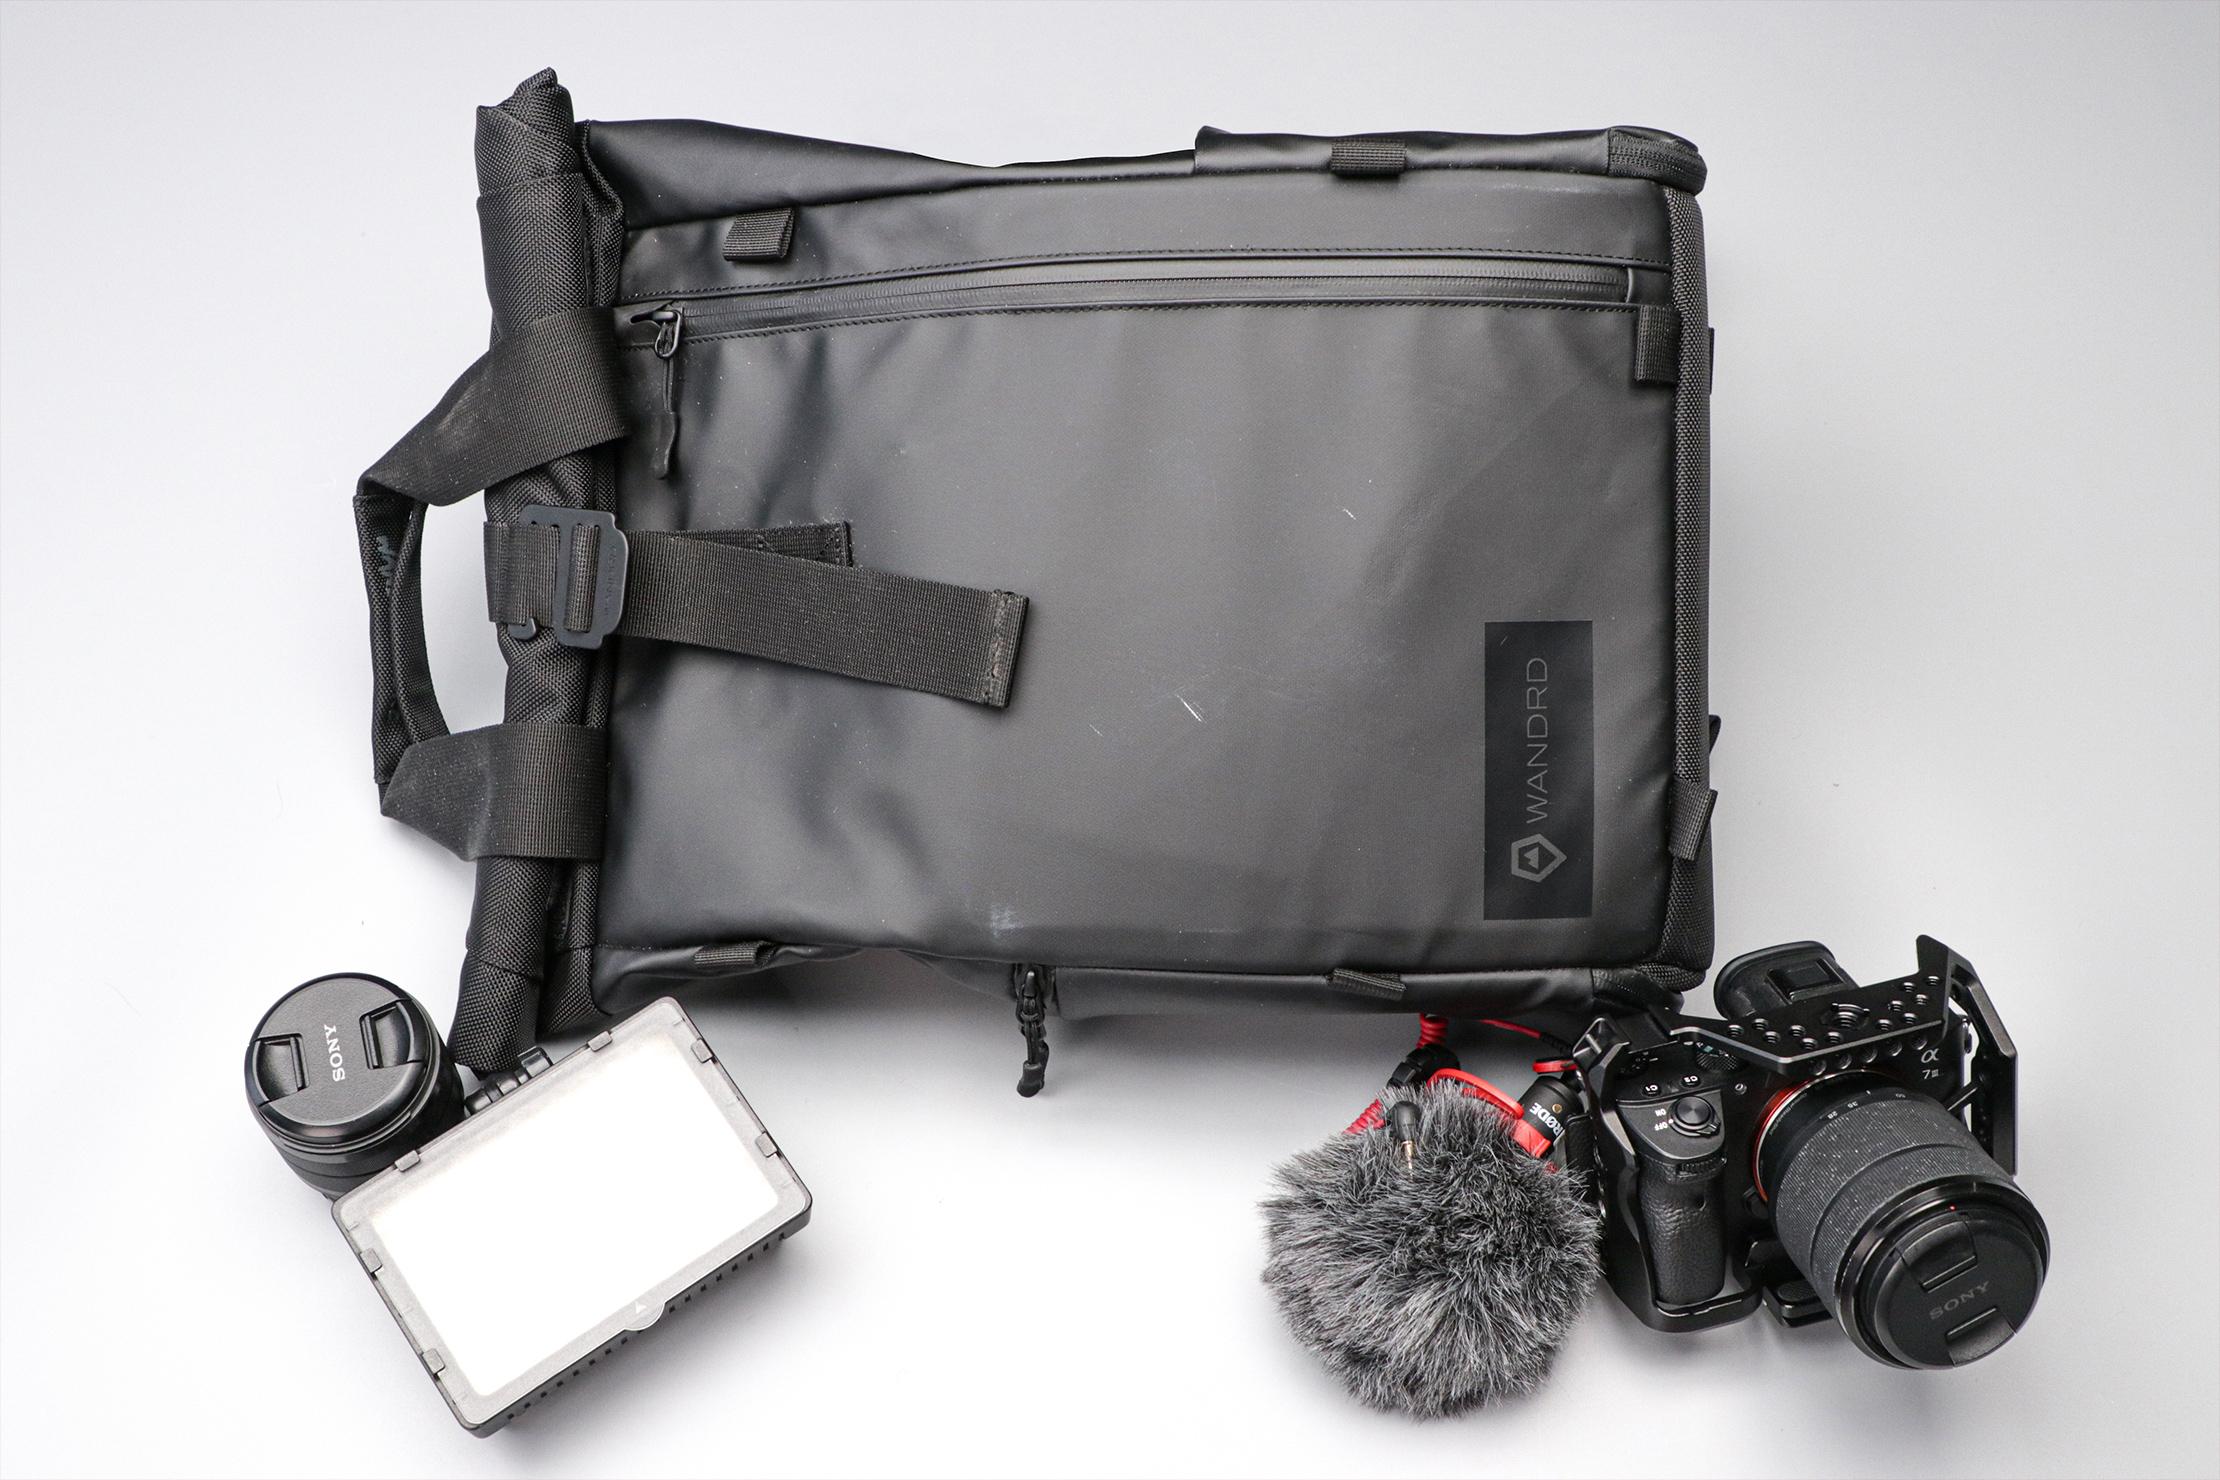 WANDRD PRVKE Lite Bag Gear